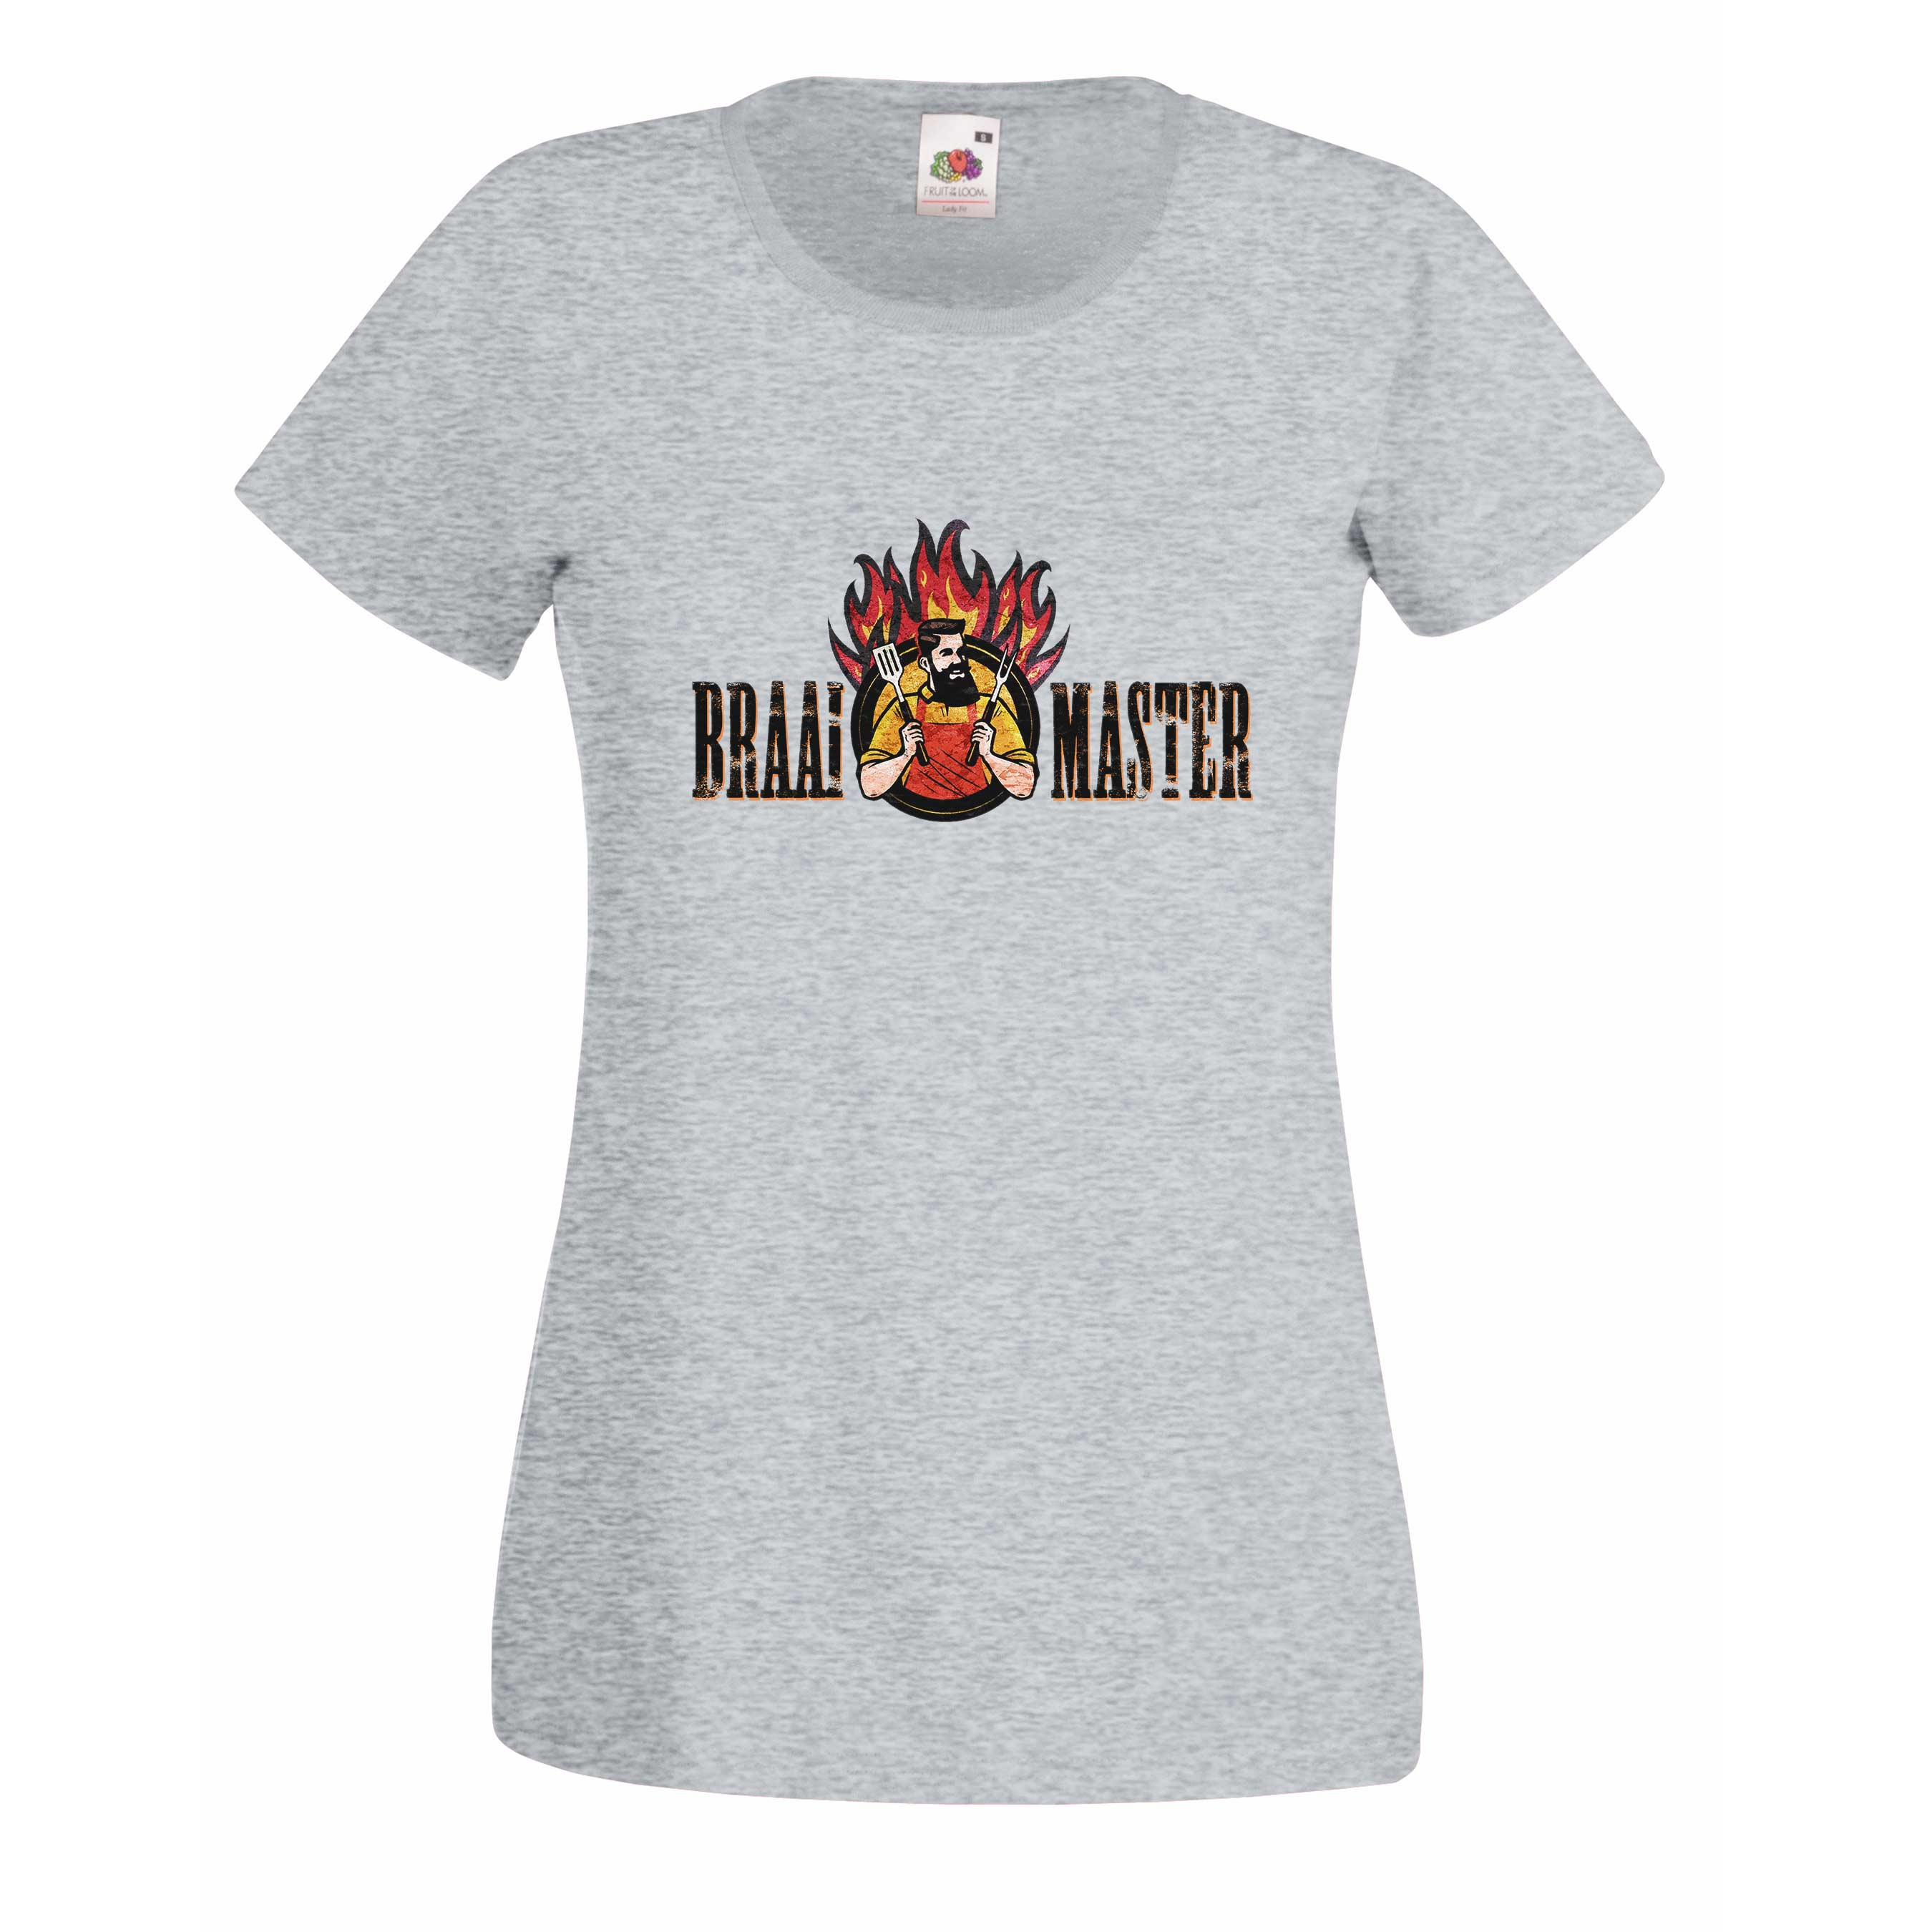 Braai Master 2 design for t-shirt, hoodie & sweatshirt